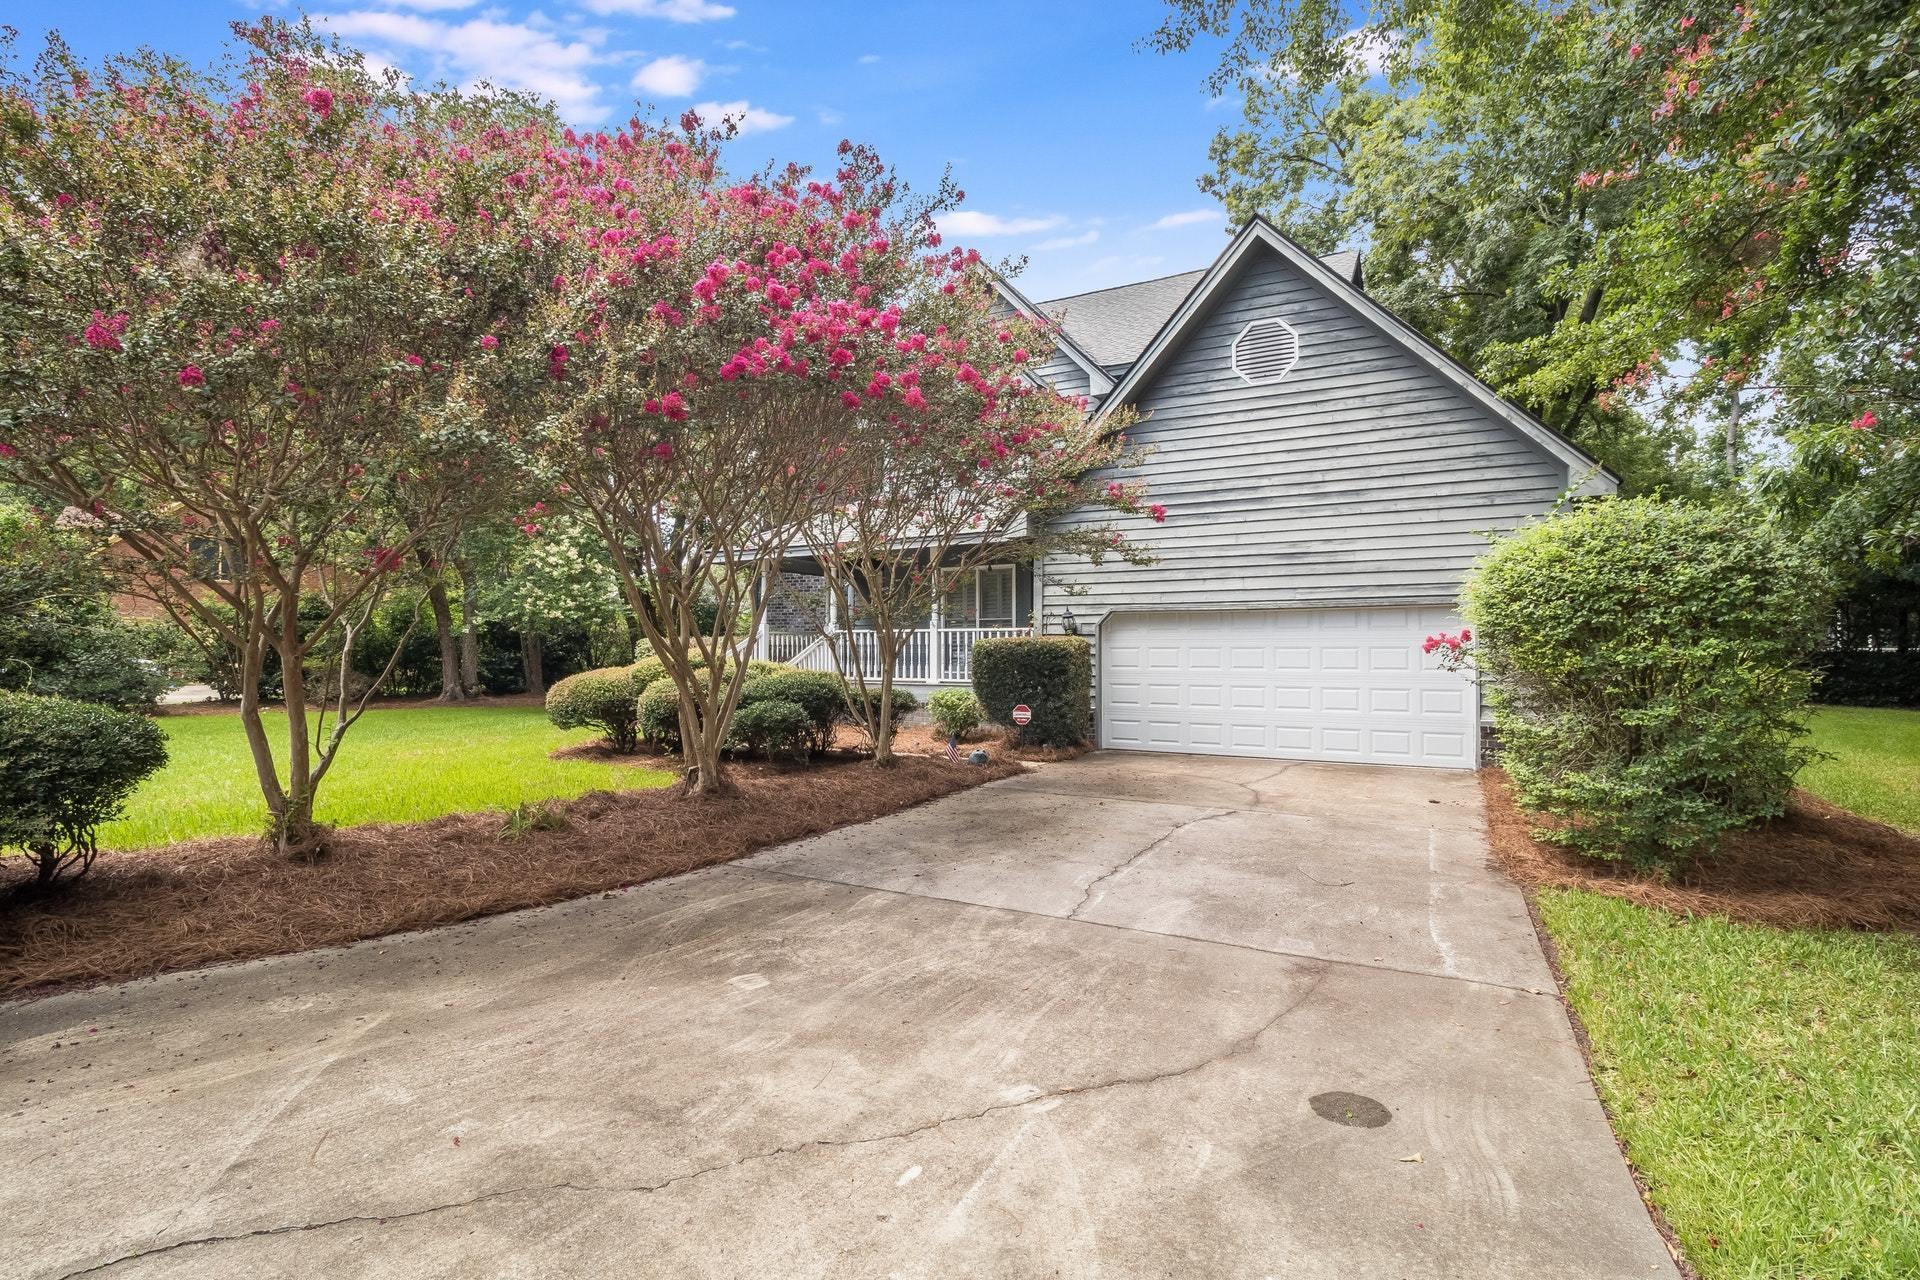 Molasses Creek Homes For Sale - 396 Sirop, Mount Pleasant, SC - 8